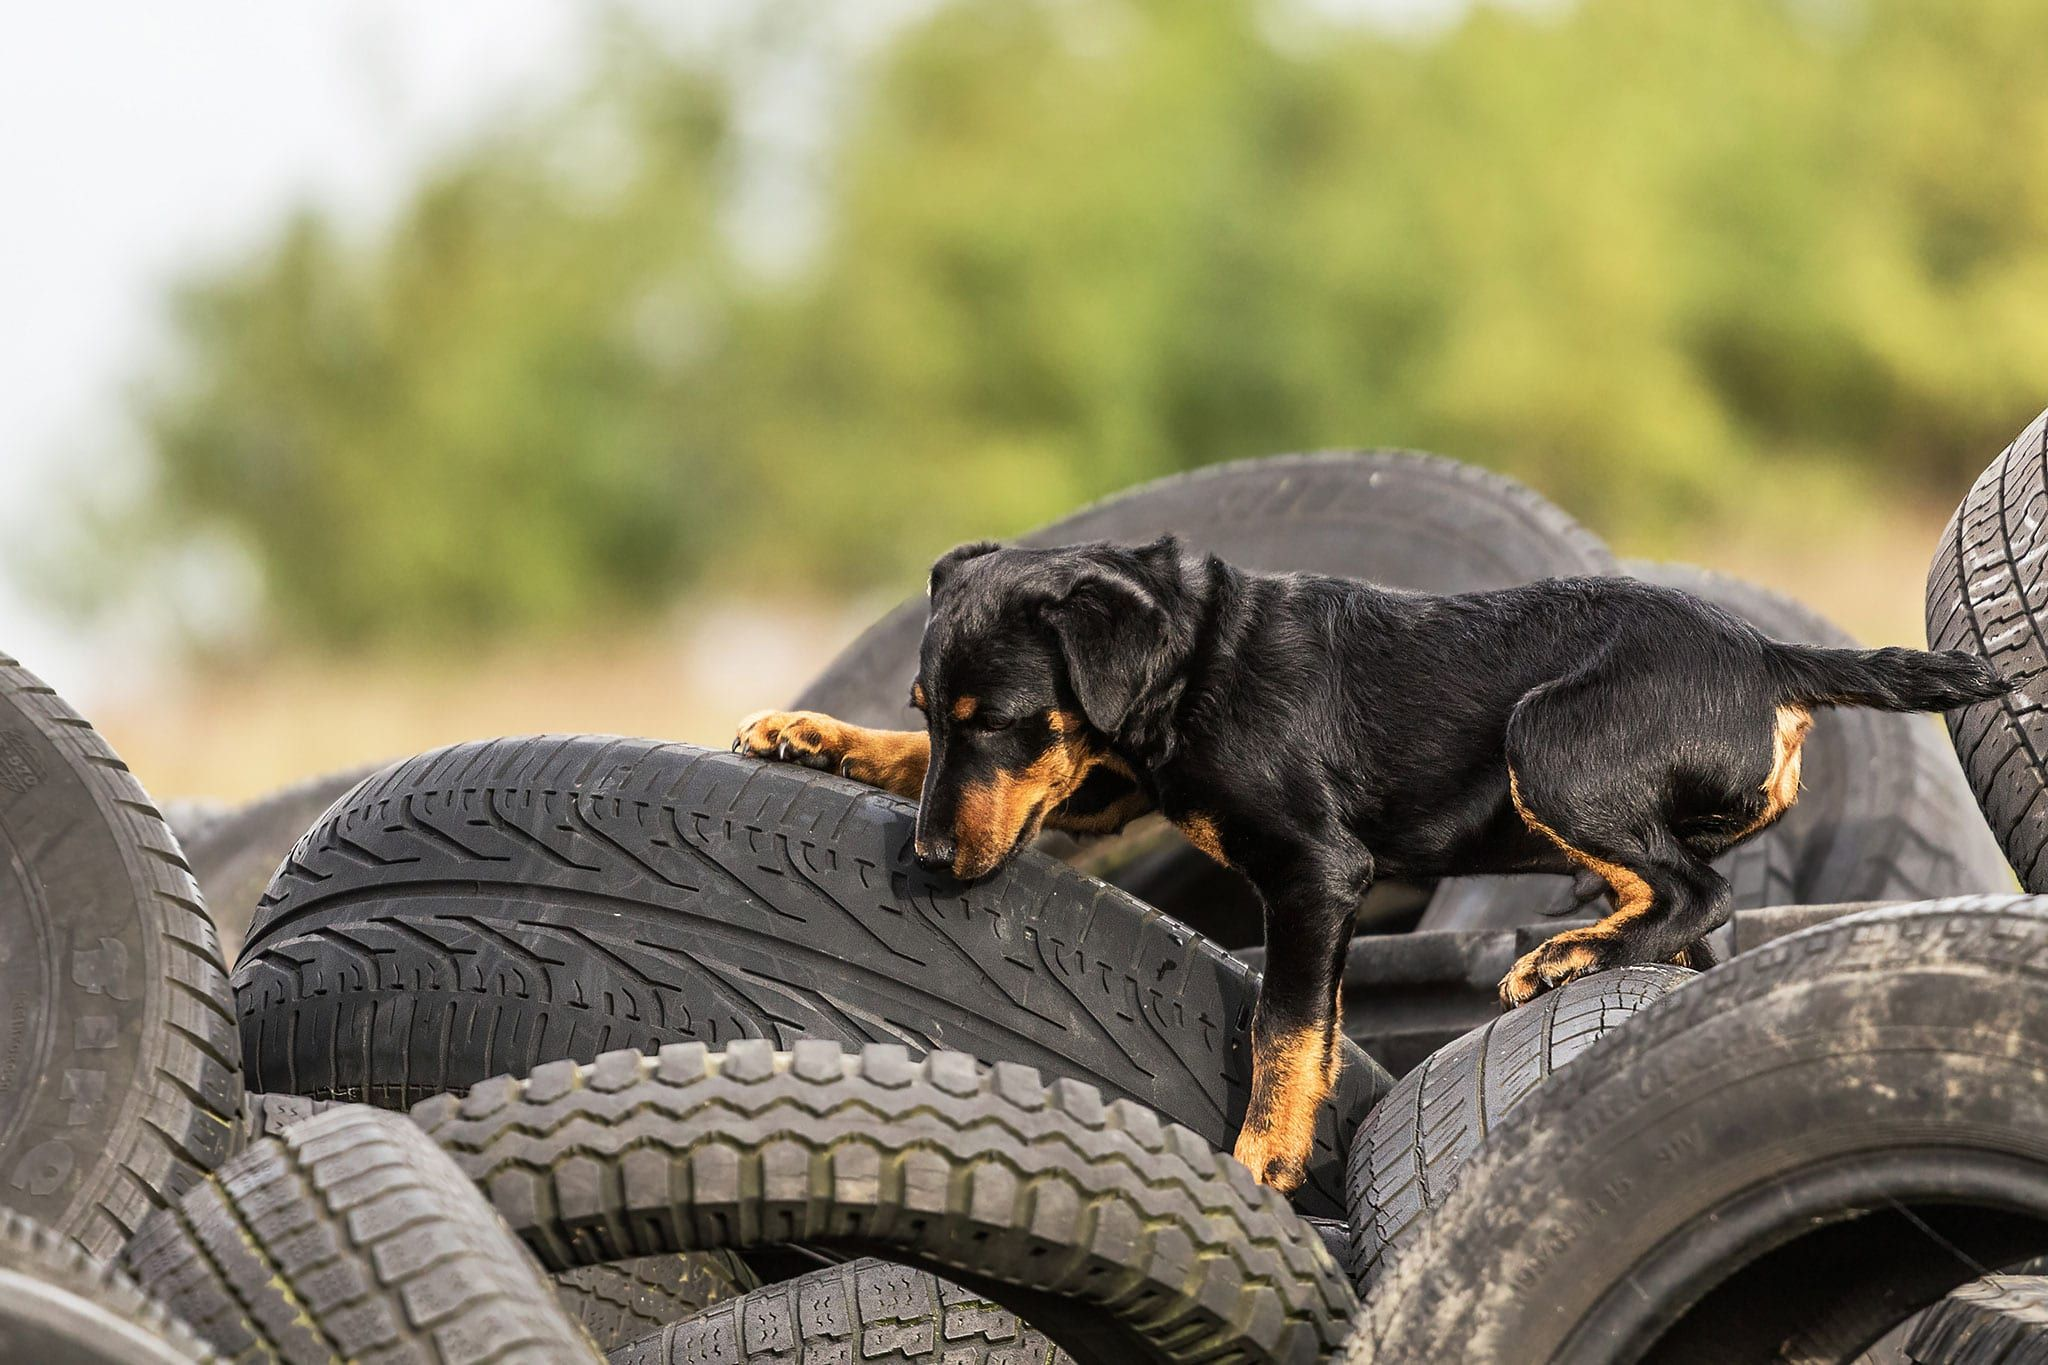 Deutscher Jagdterrier Welpe Rettungshund Hundefotografie Potsdam Hundesport Jagdhund Sophia Zoike Photography Hunde Jagdhunde Rettungshunde